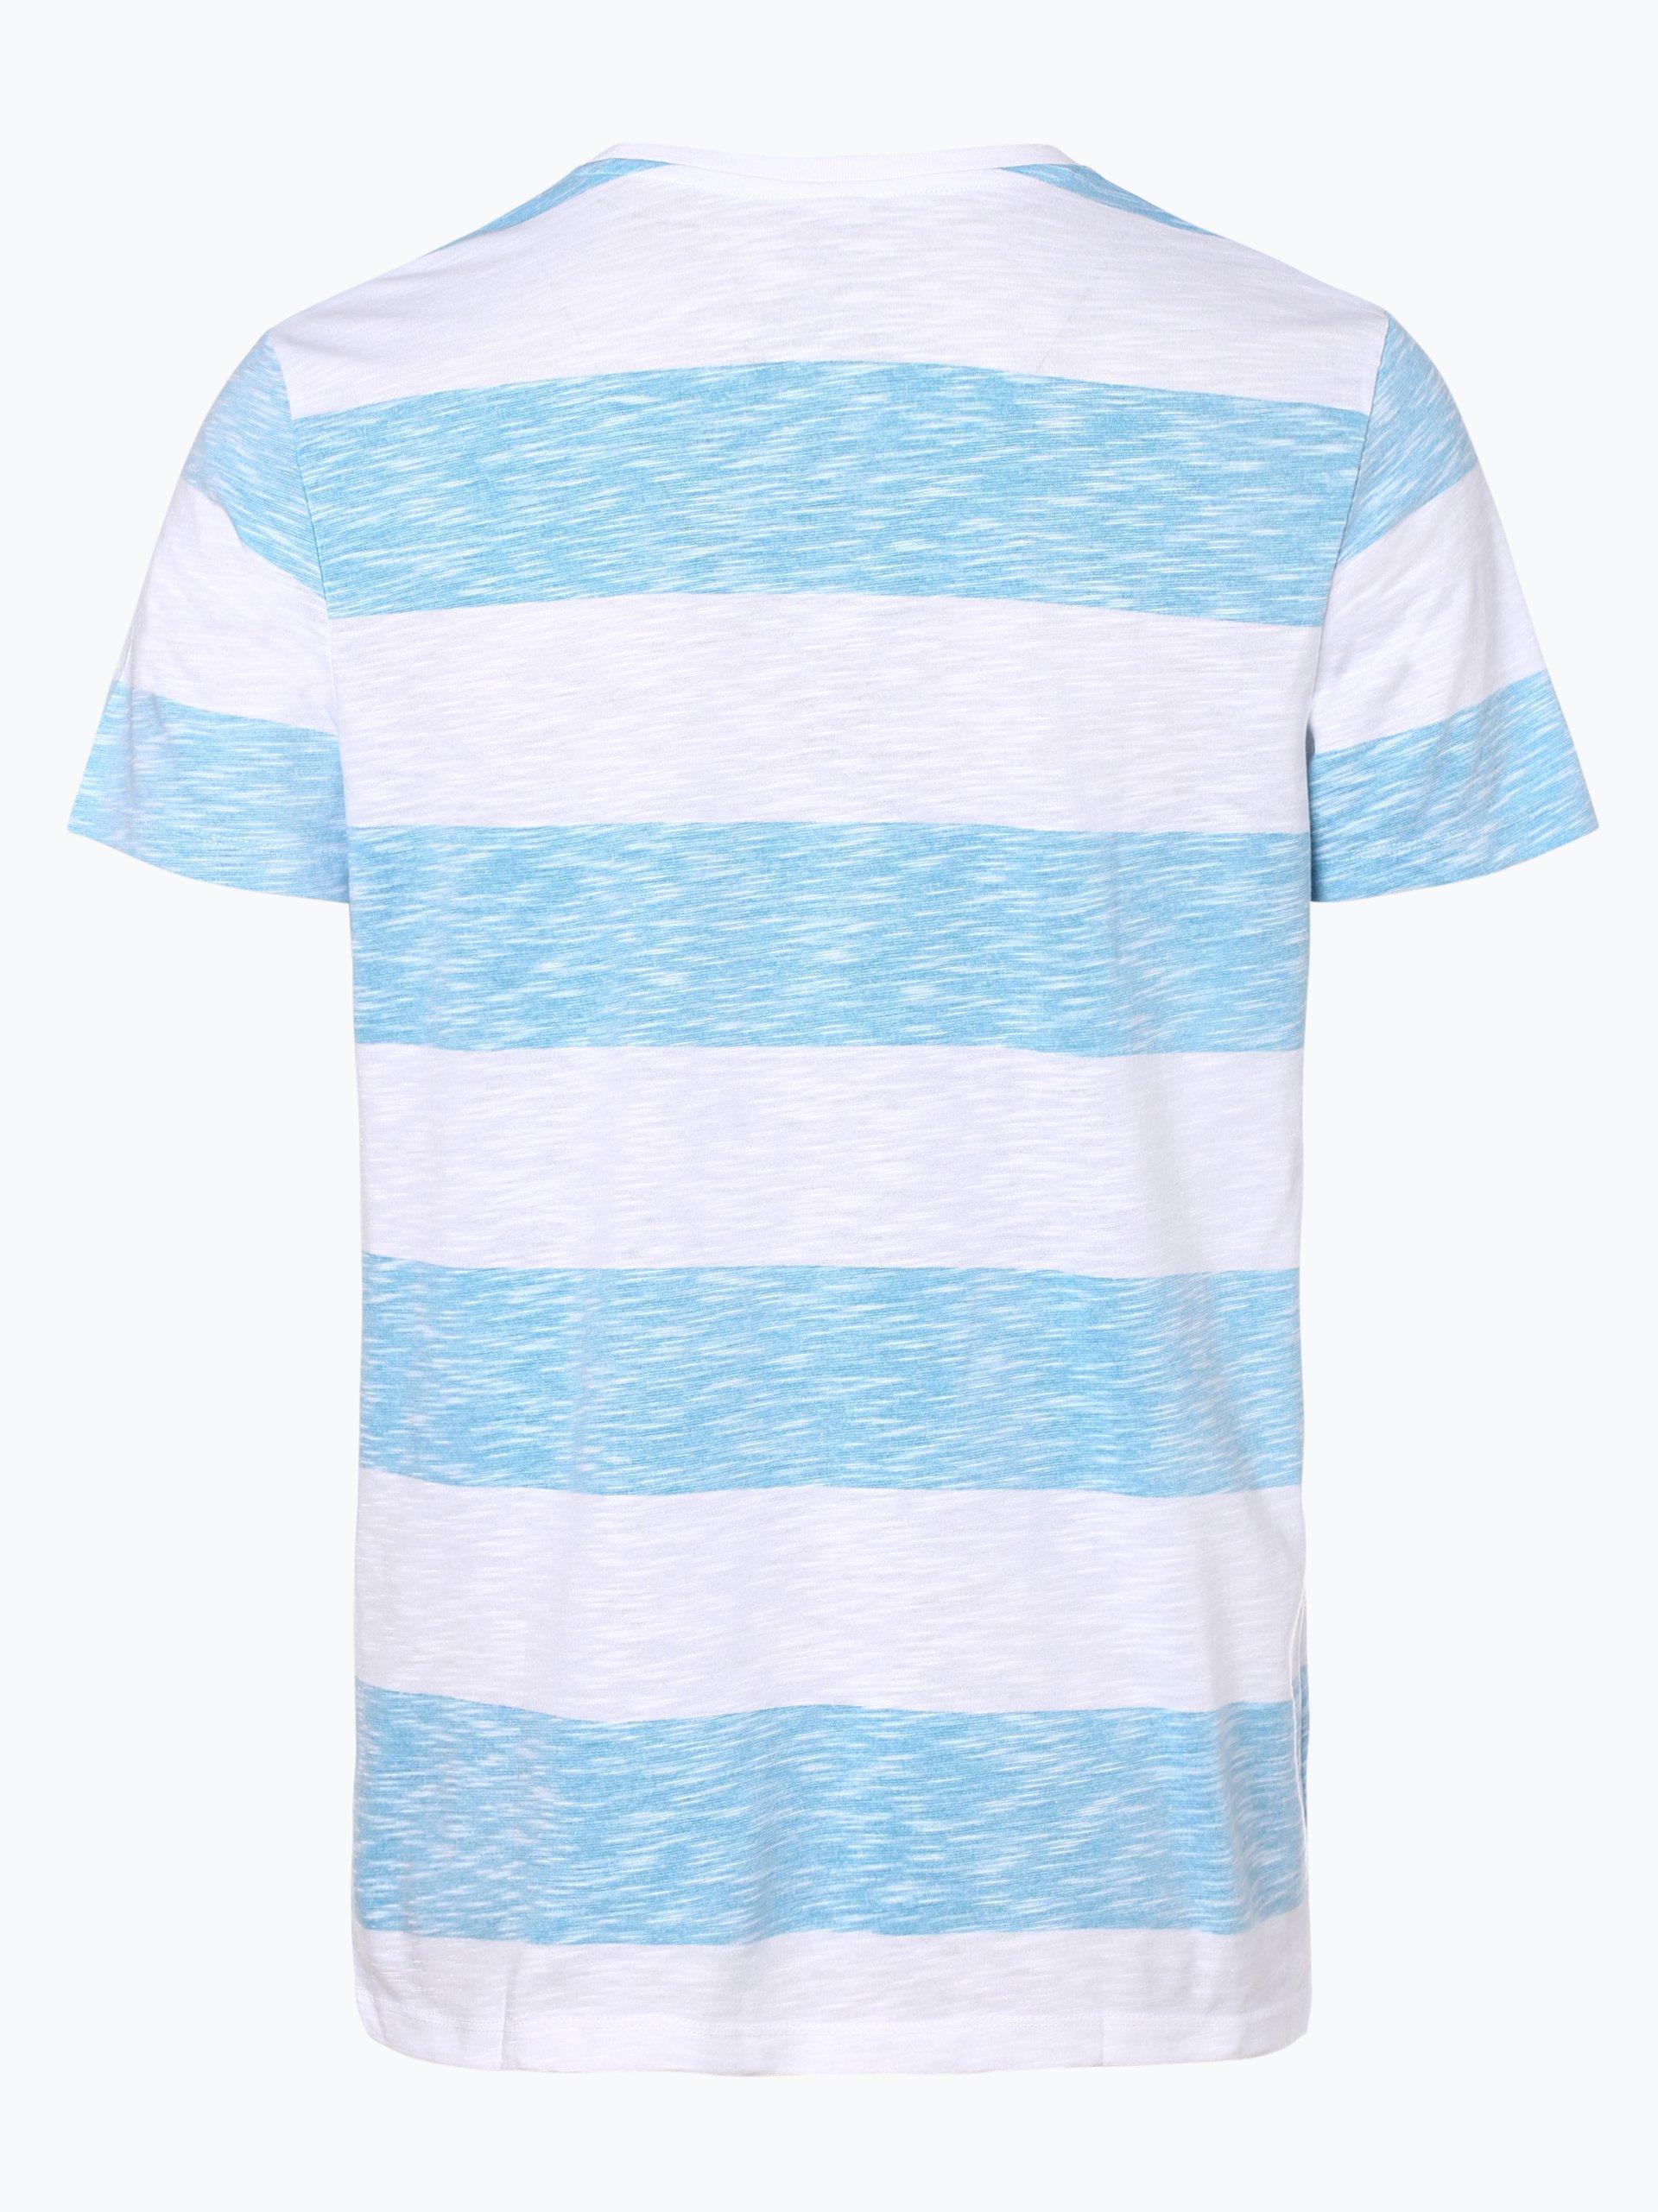 Jack & Jones T-shirt męski – Jcostray